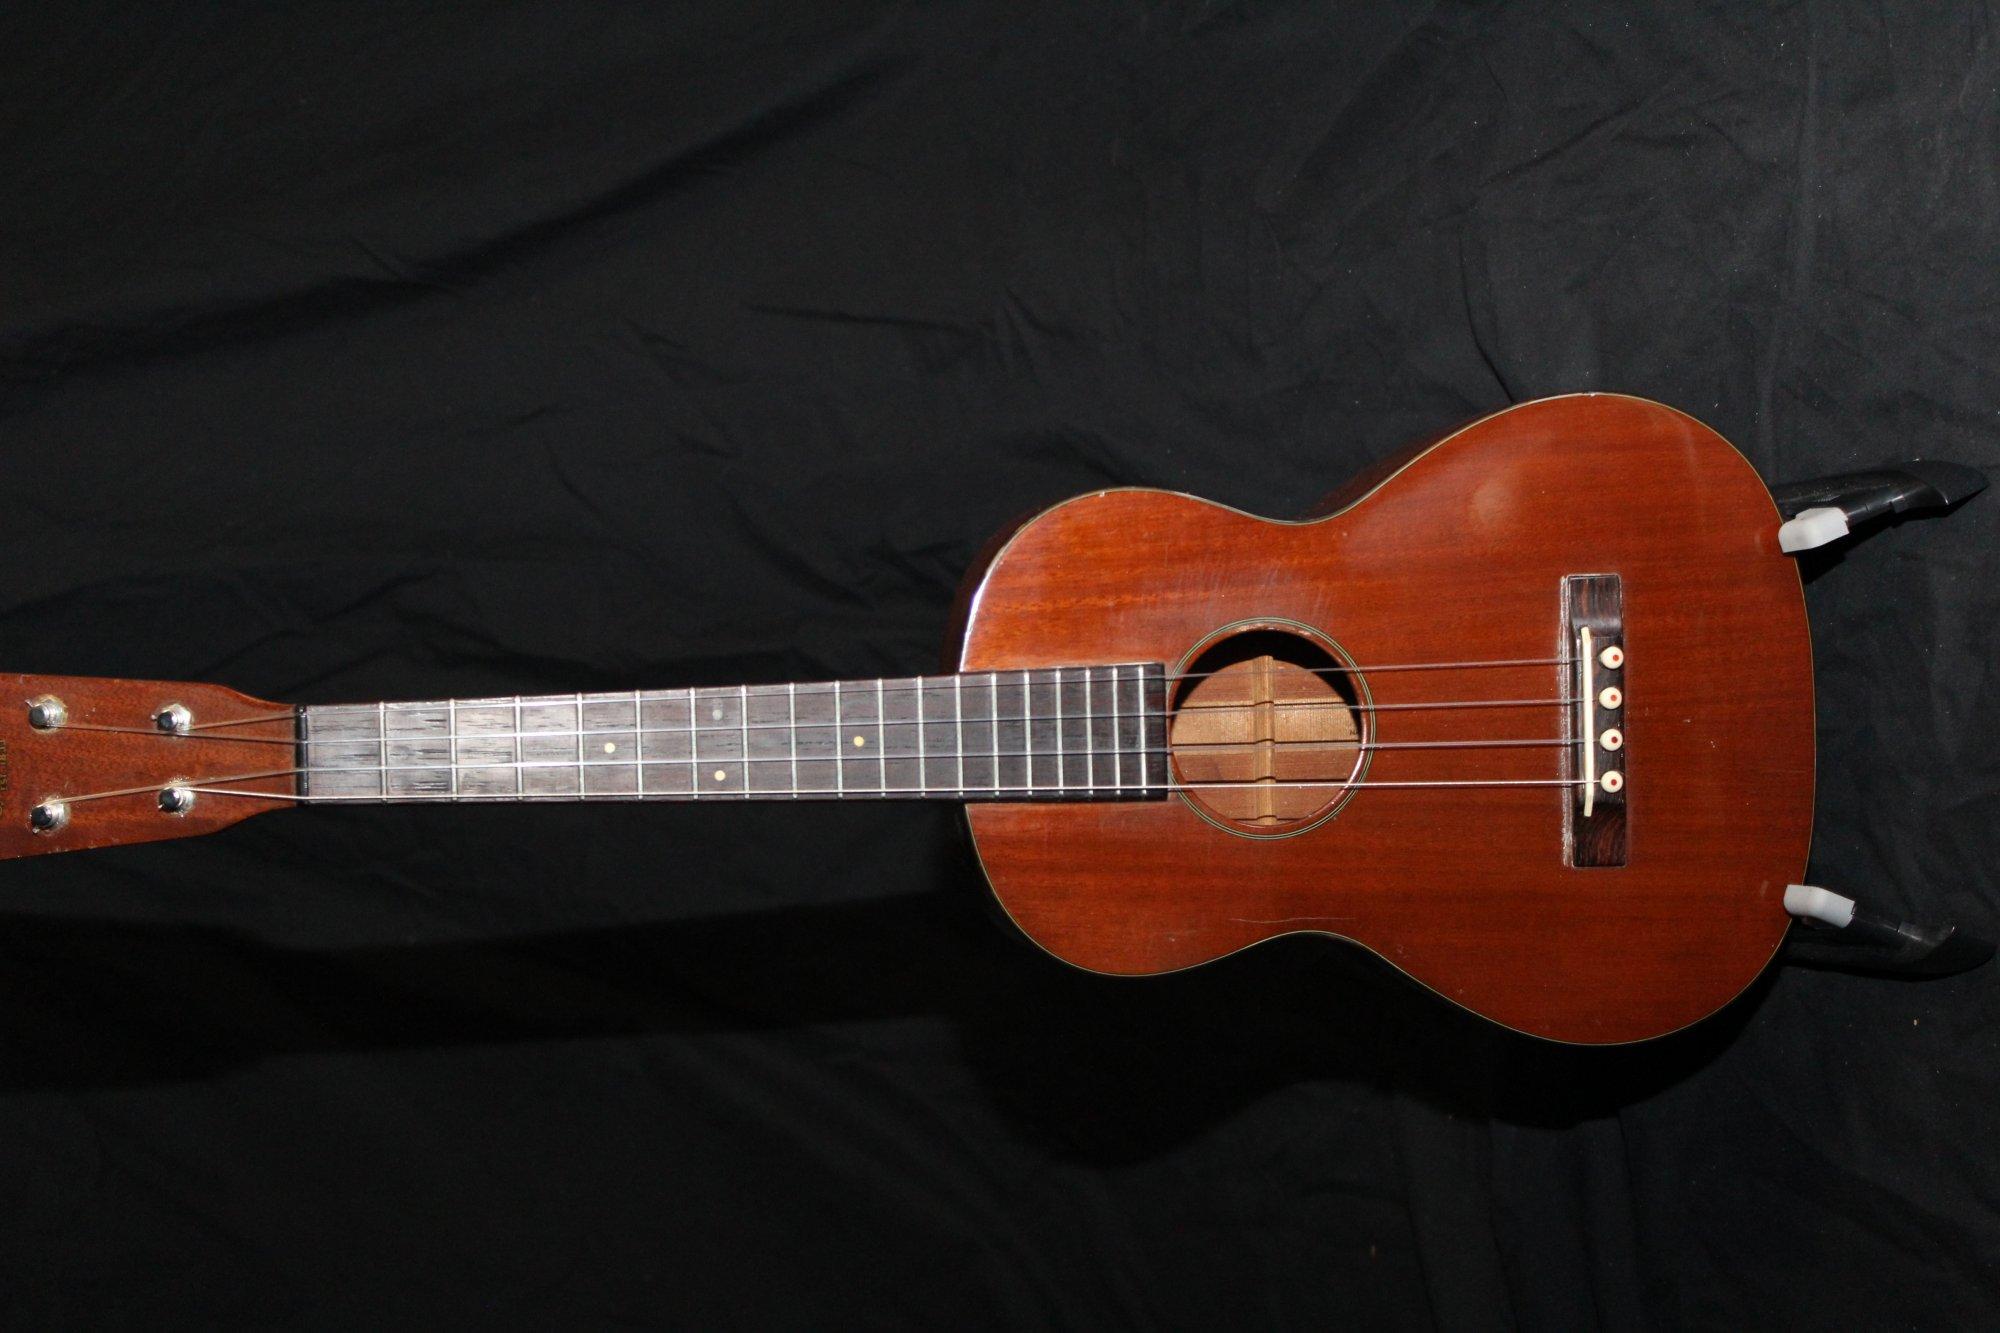 Preowned 1950's Martin Style 1T Tenor Ukulele w/Case